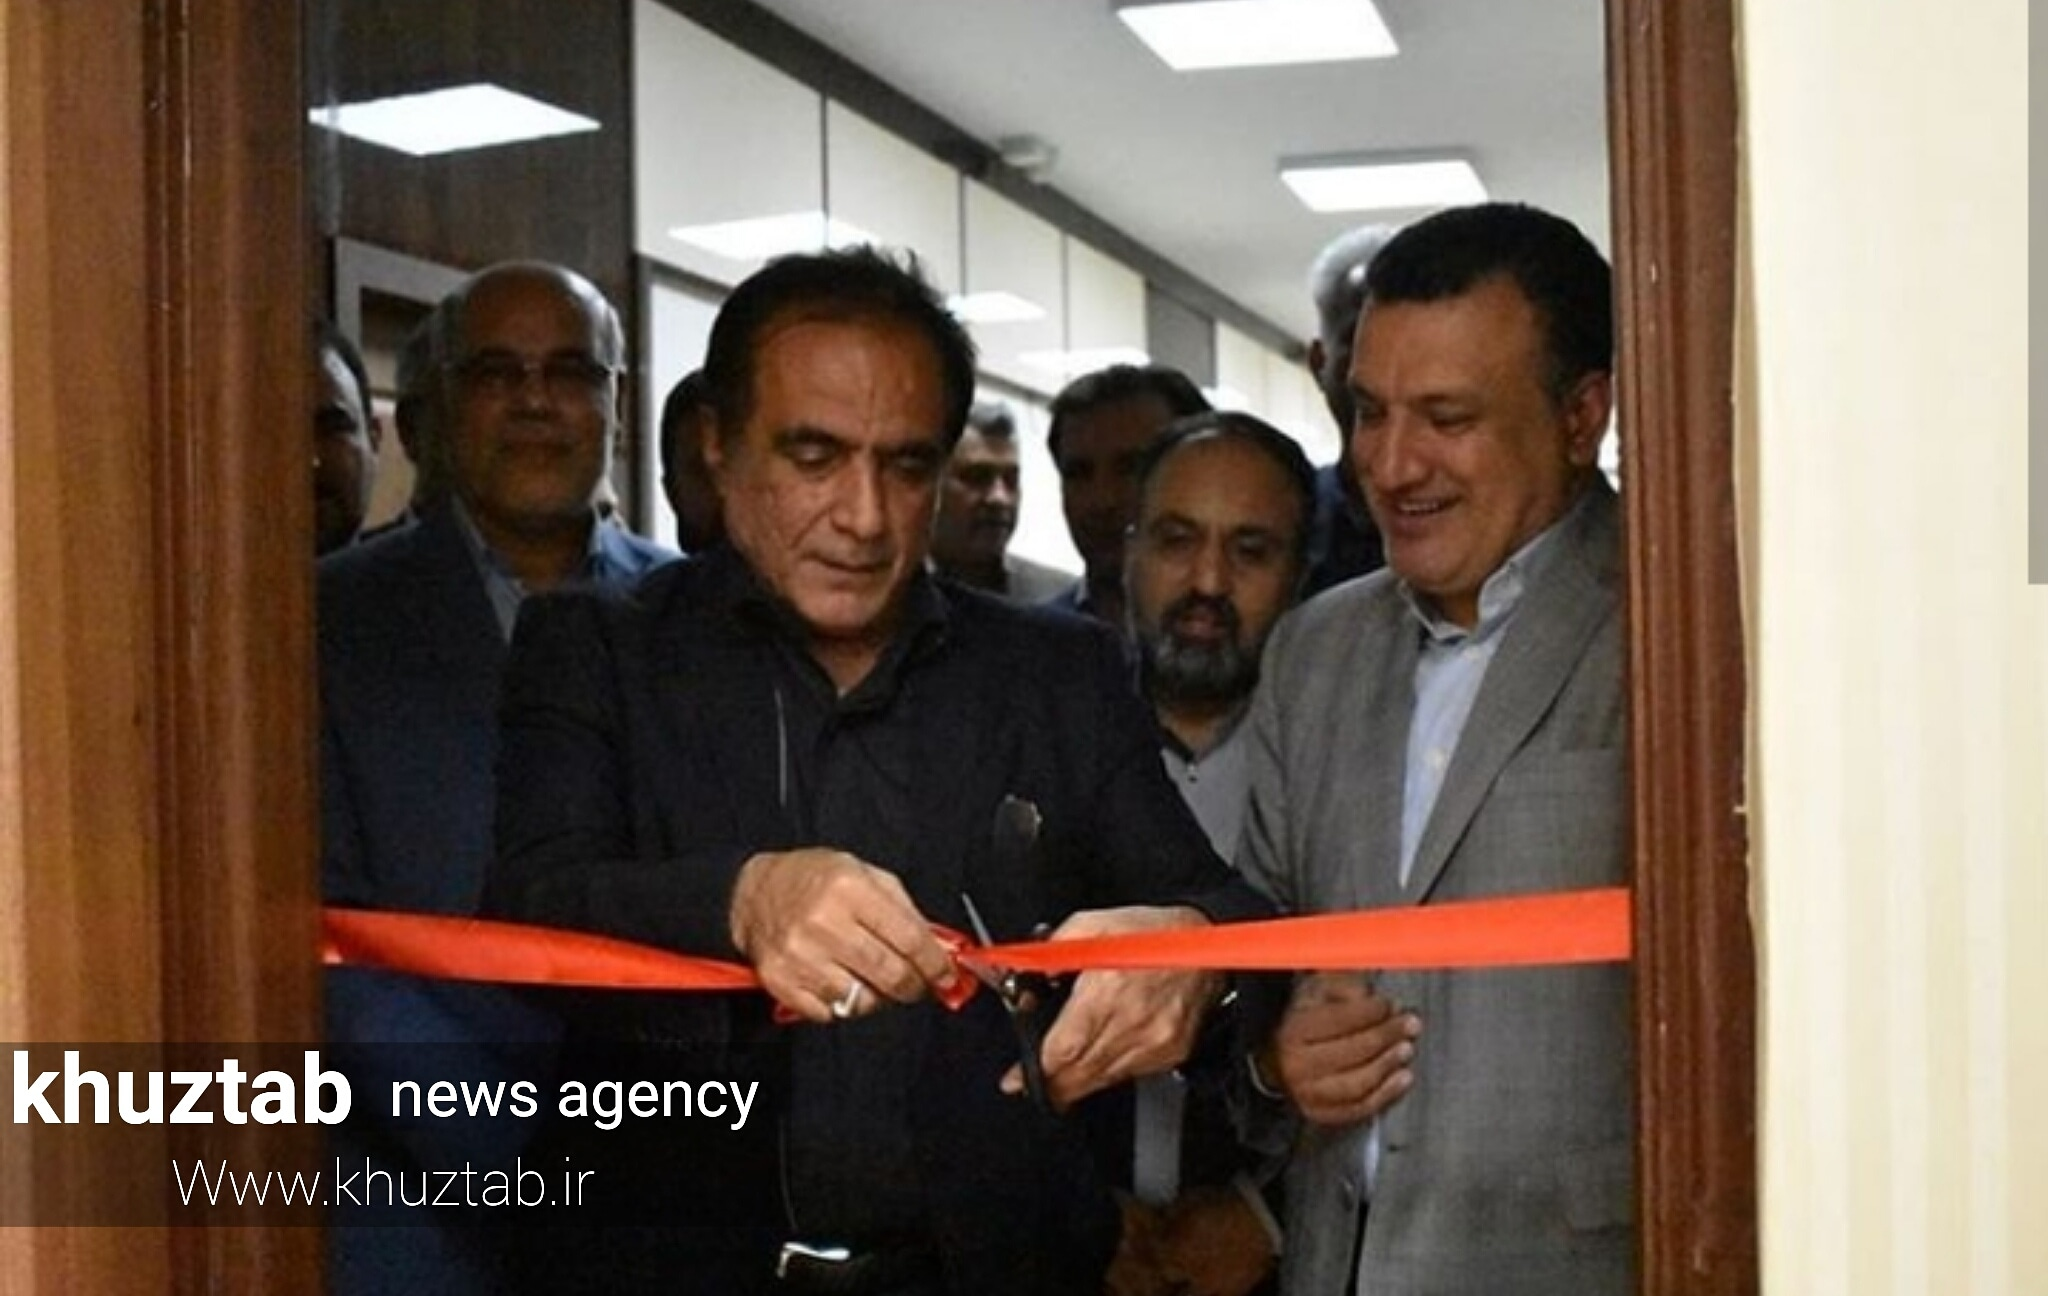 IMG 20190724 201749 558 دفتر تشکل های اقتصادی و کانون کارفرمایی استان خوزستان افتتاح شد